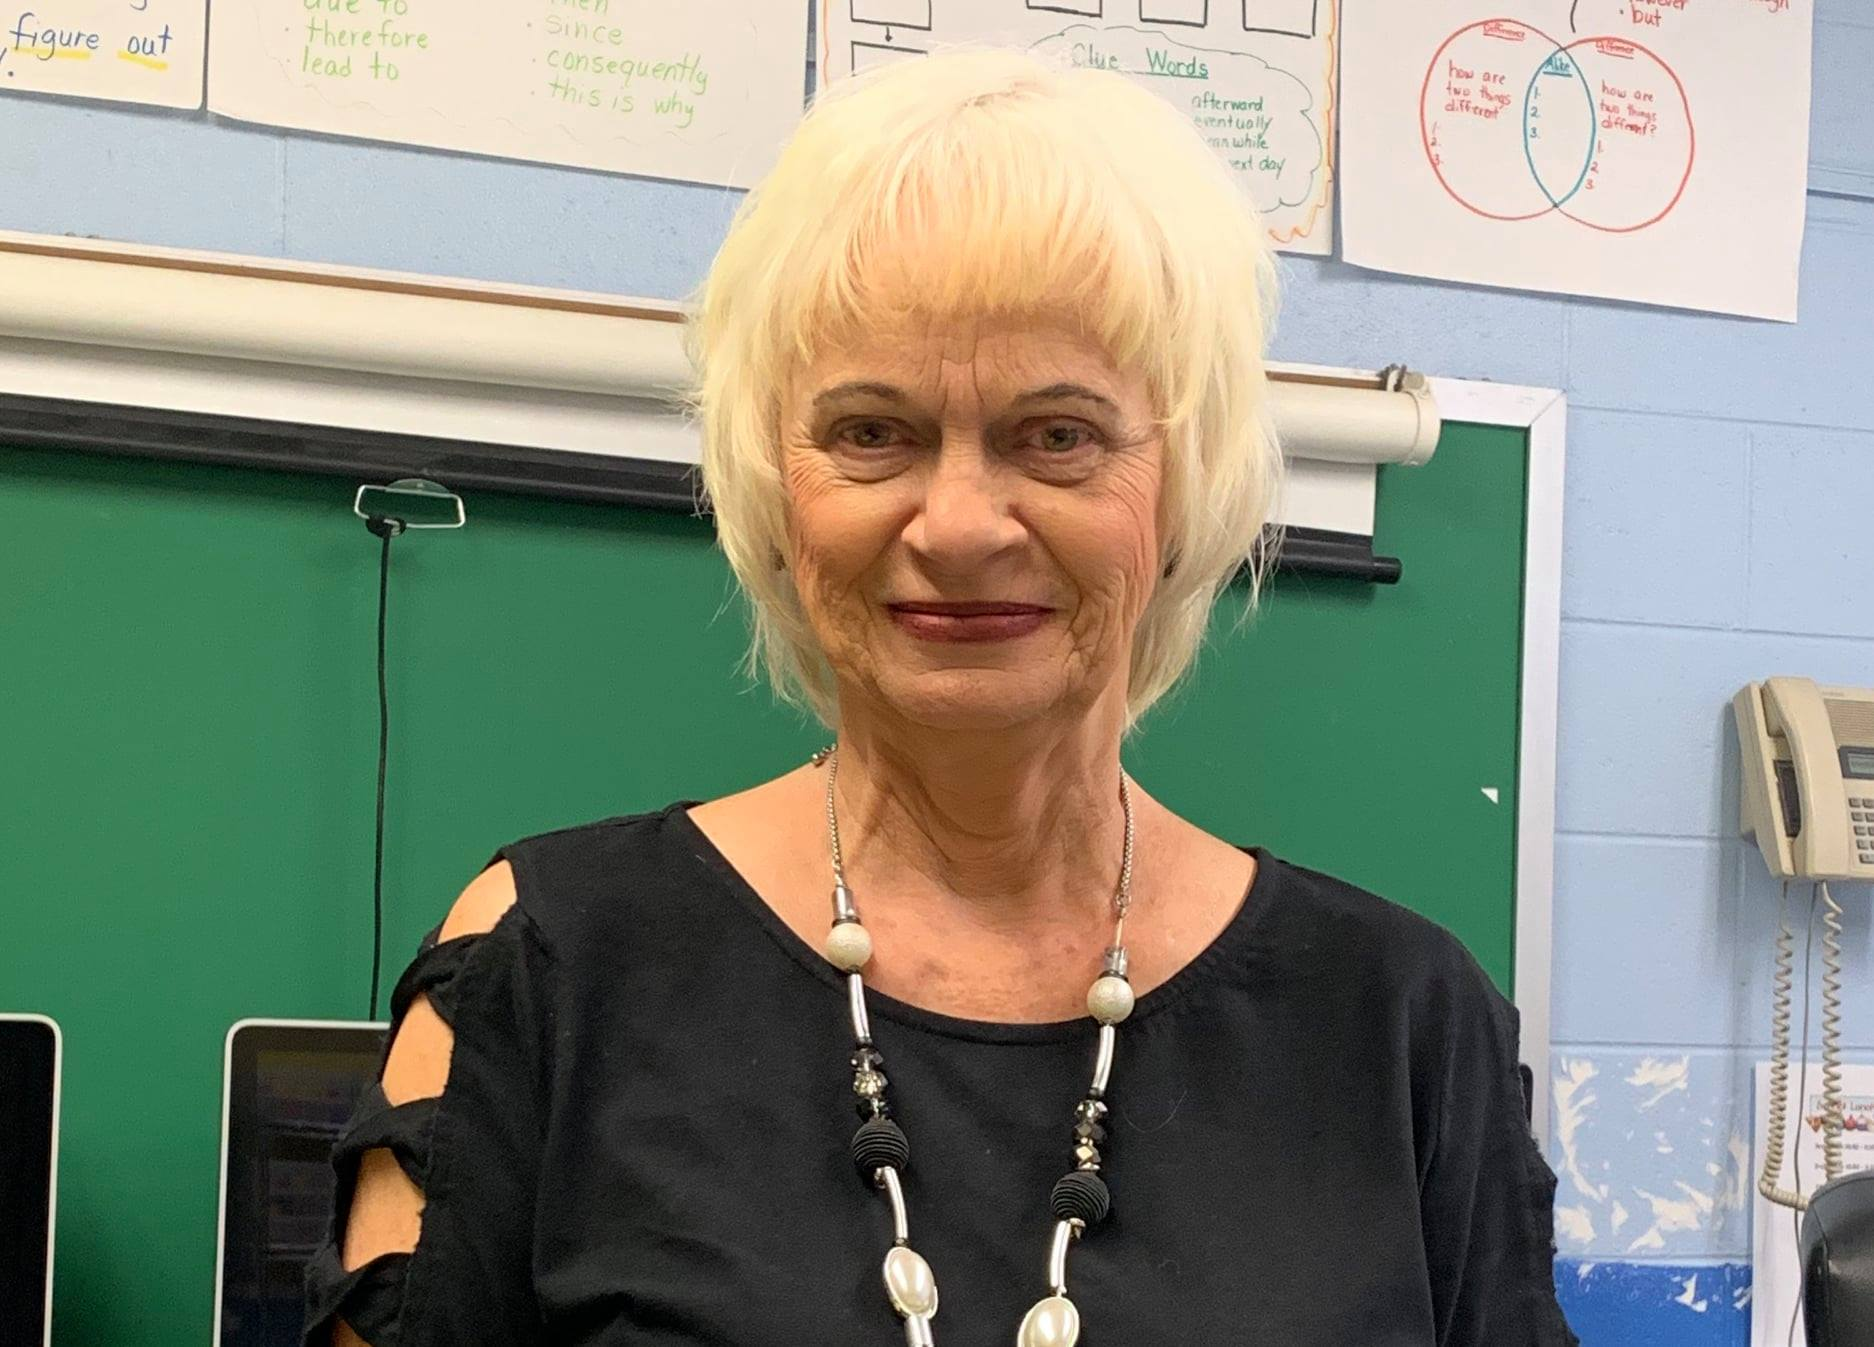 Mrs. Bolt